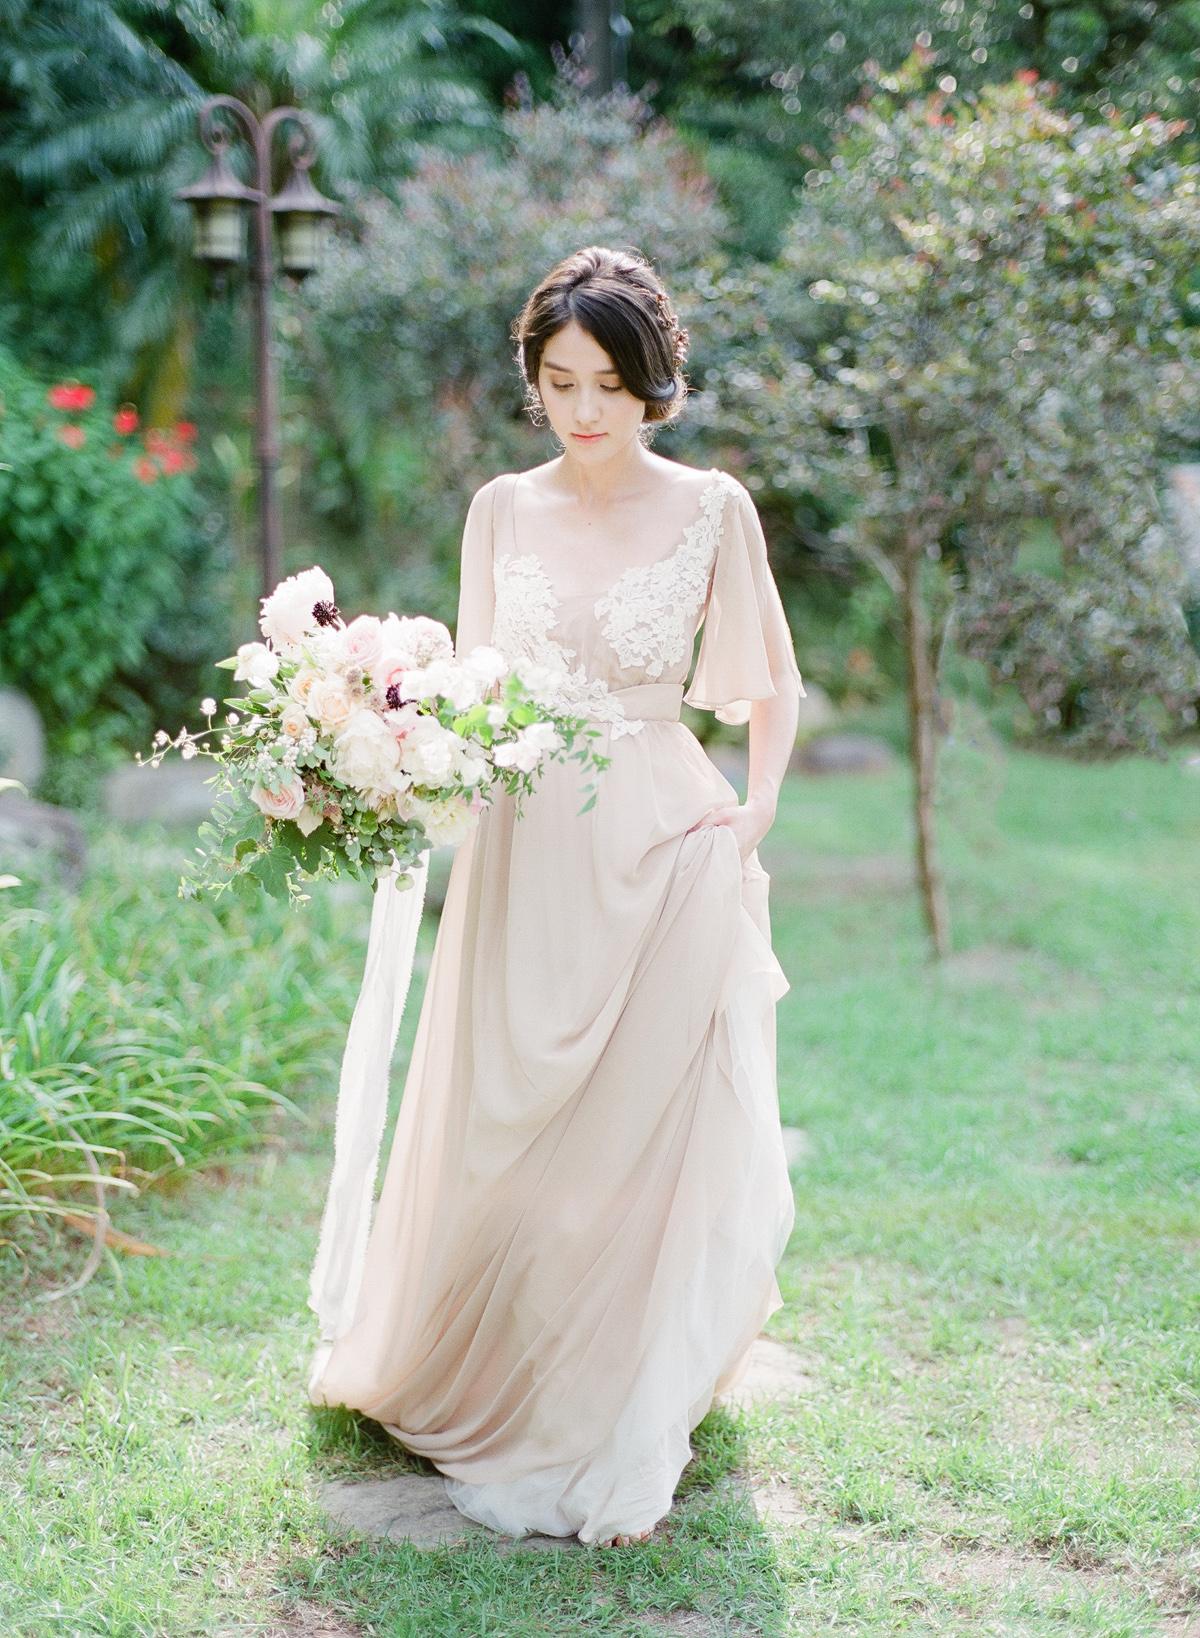 Jill-loves-lace-美式婚紗-mark-hong-styled-0043